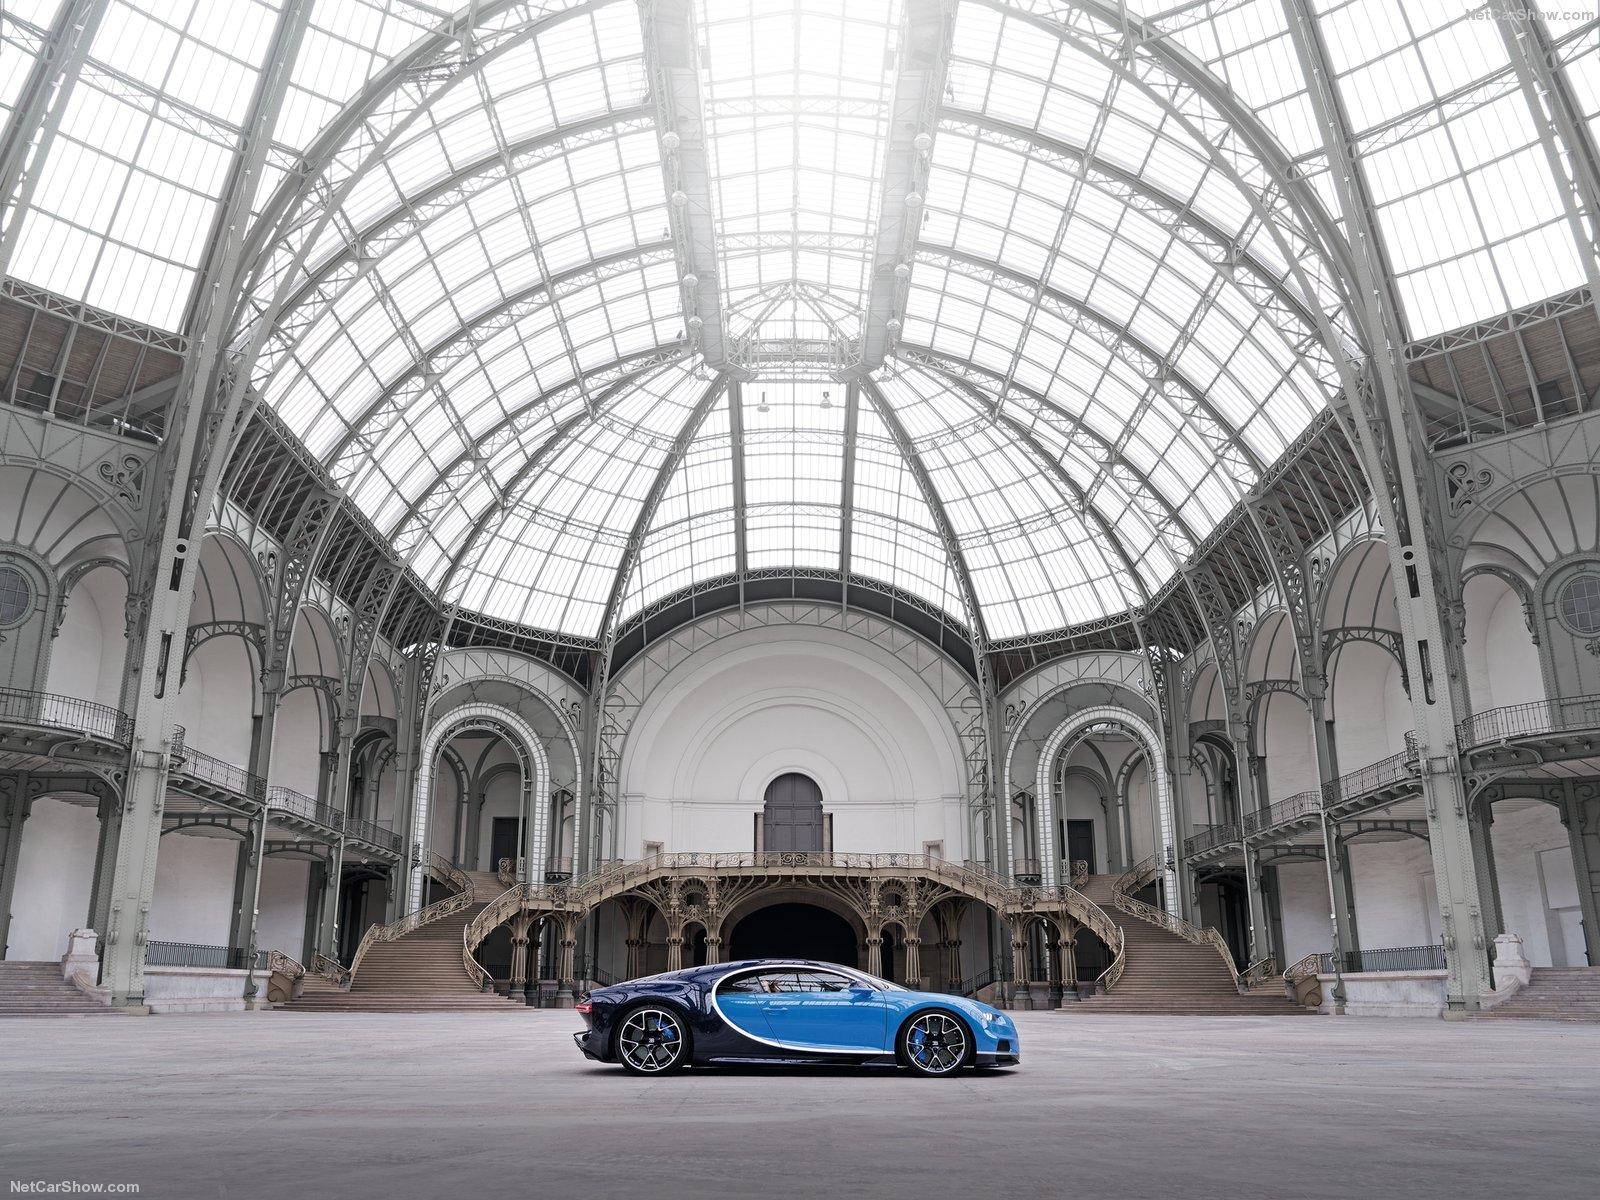 Bugatti-Chiron_2017_1600x1200_wallpaper_12